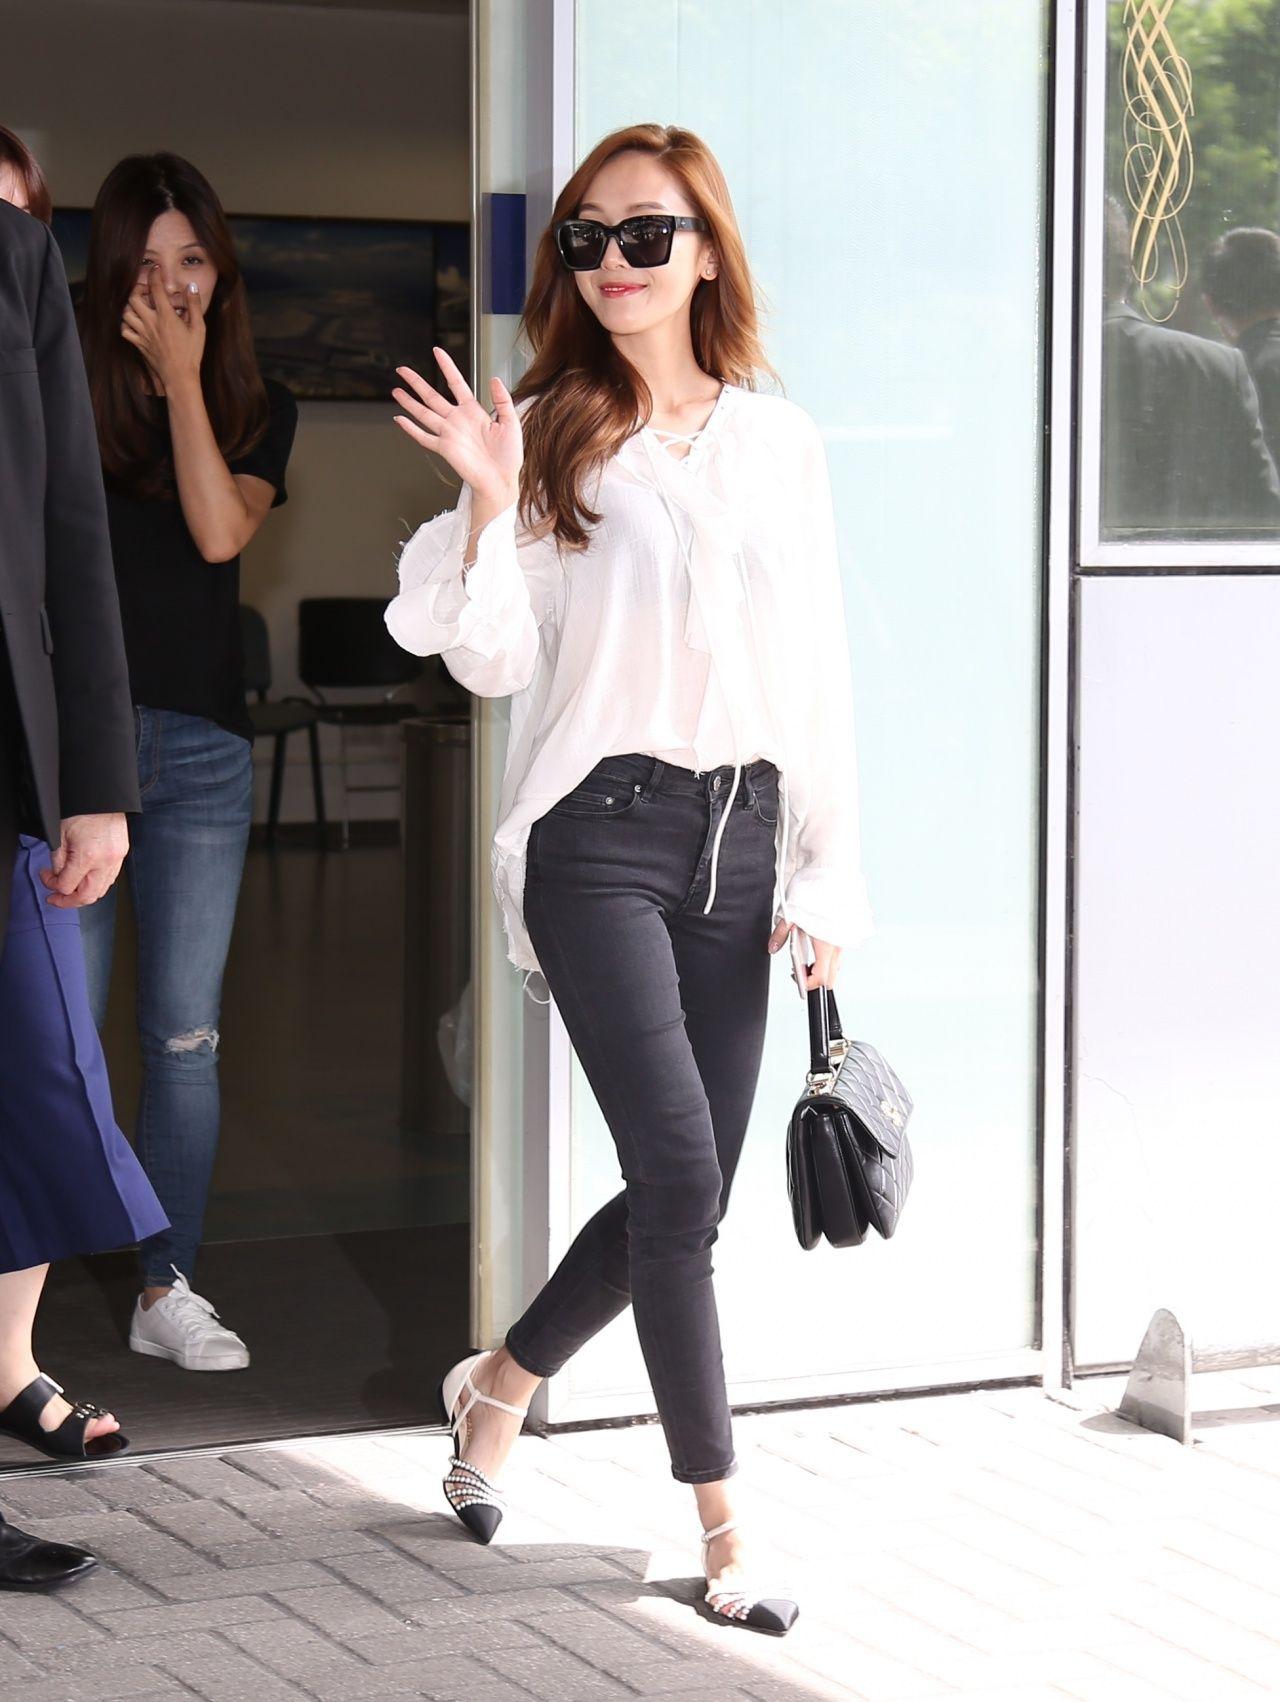 Jessica Jung Airport Fashion 160719 2016 Snsd Airport Fashion Pinterest Jessica Jung